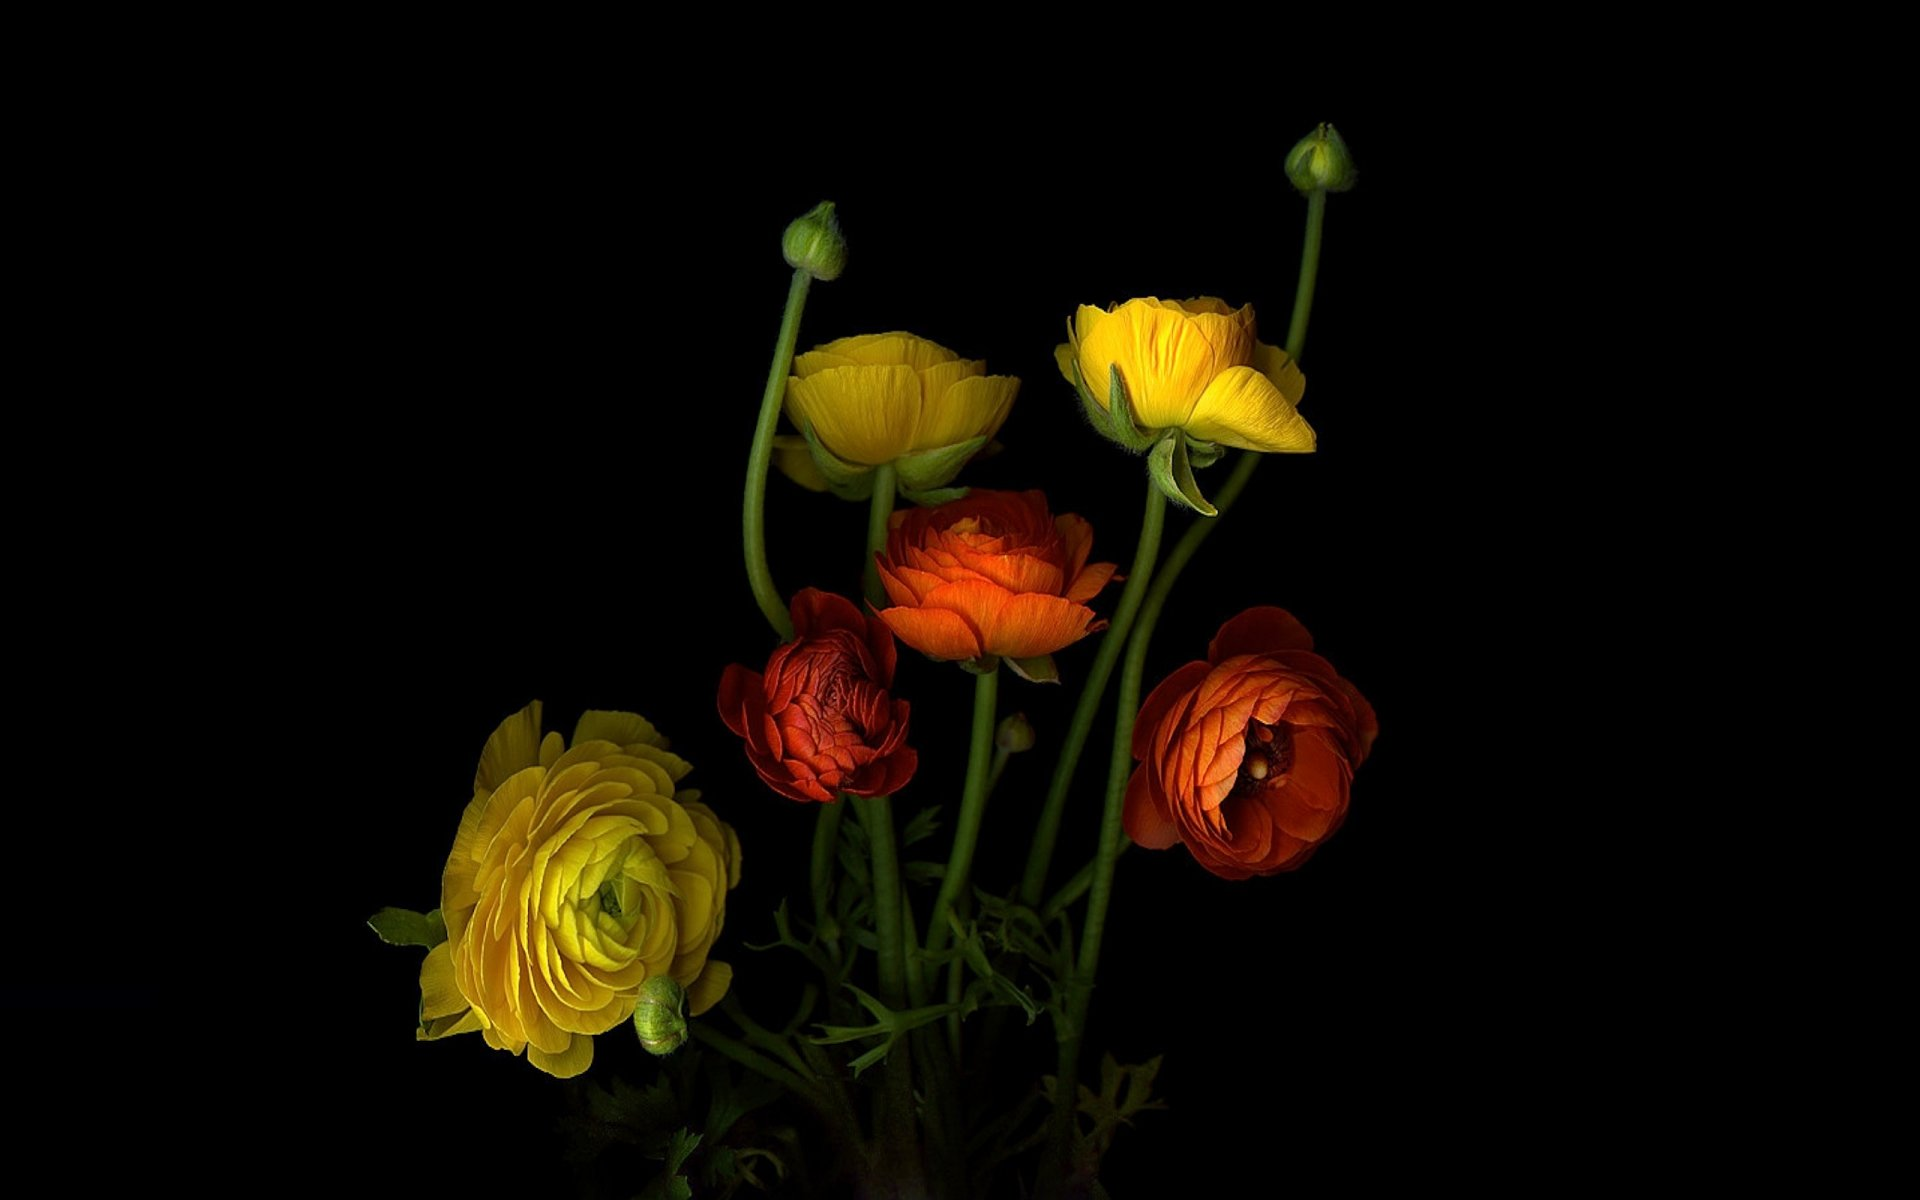 картинка с цветком на черном фоне обоев